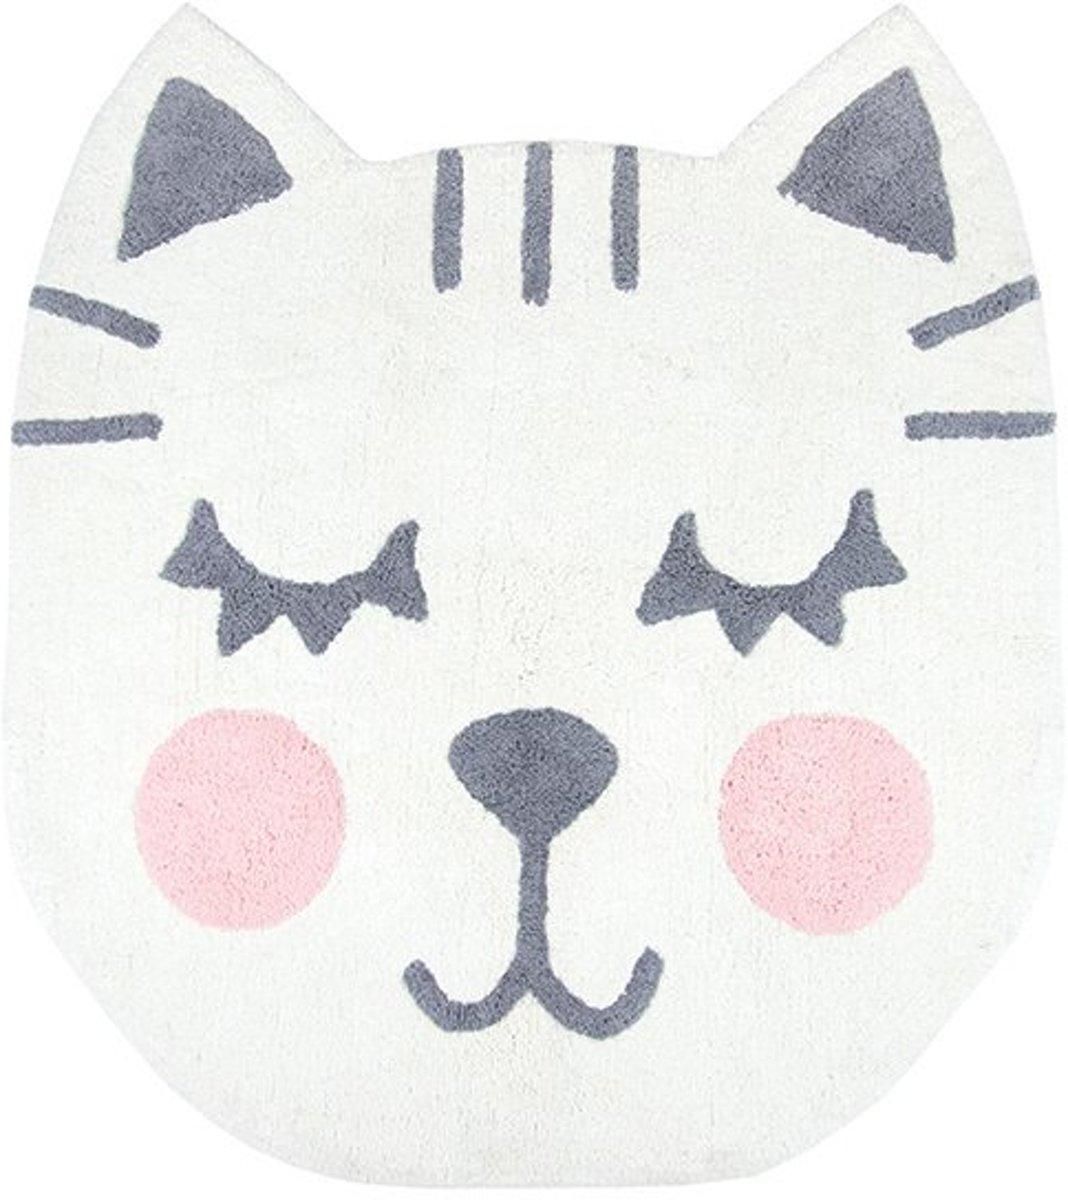 Vloerkleed Kinderkamer & Babykamer Betsy Cat - Rond Vloerkleed - Tapijt 100 x 110 cm